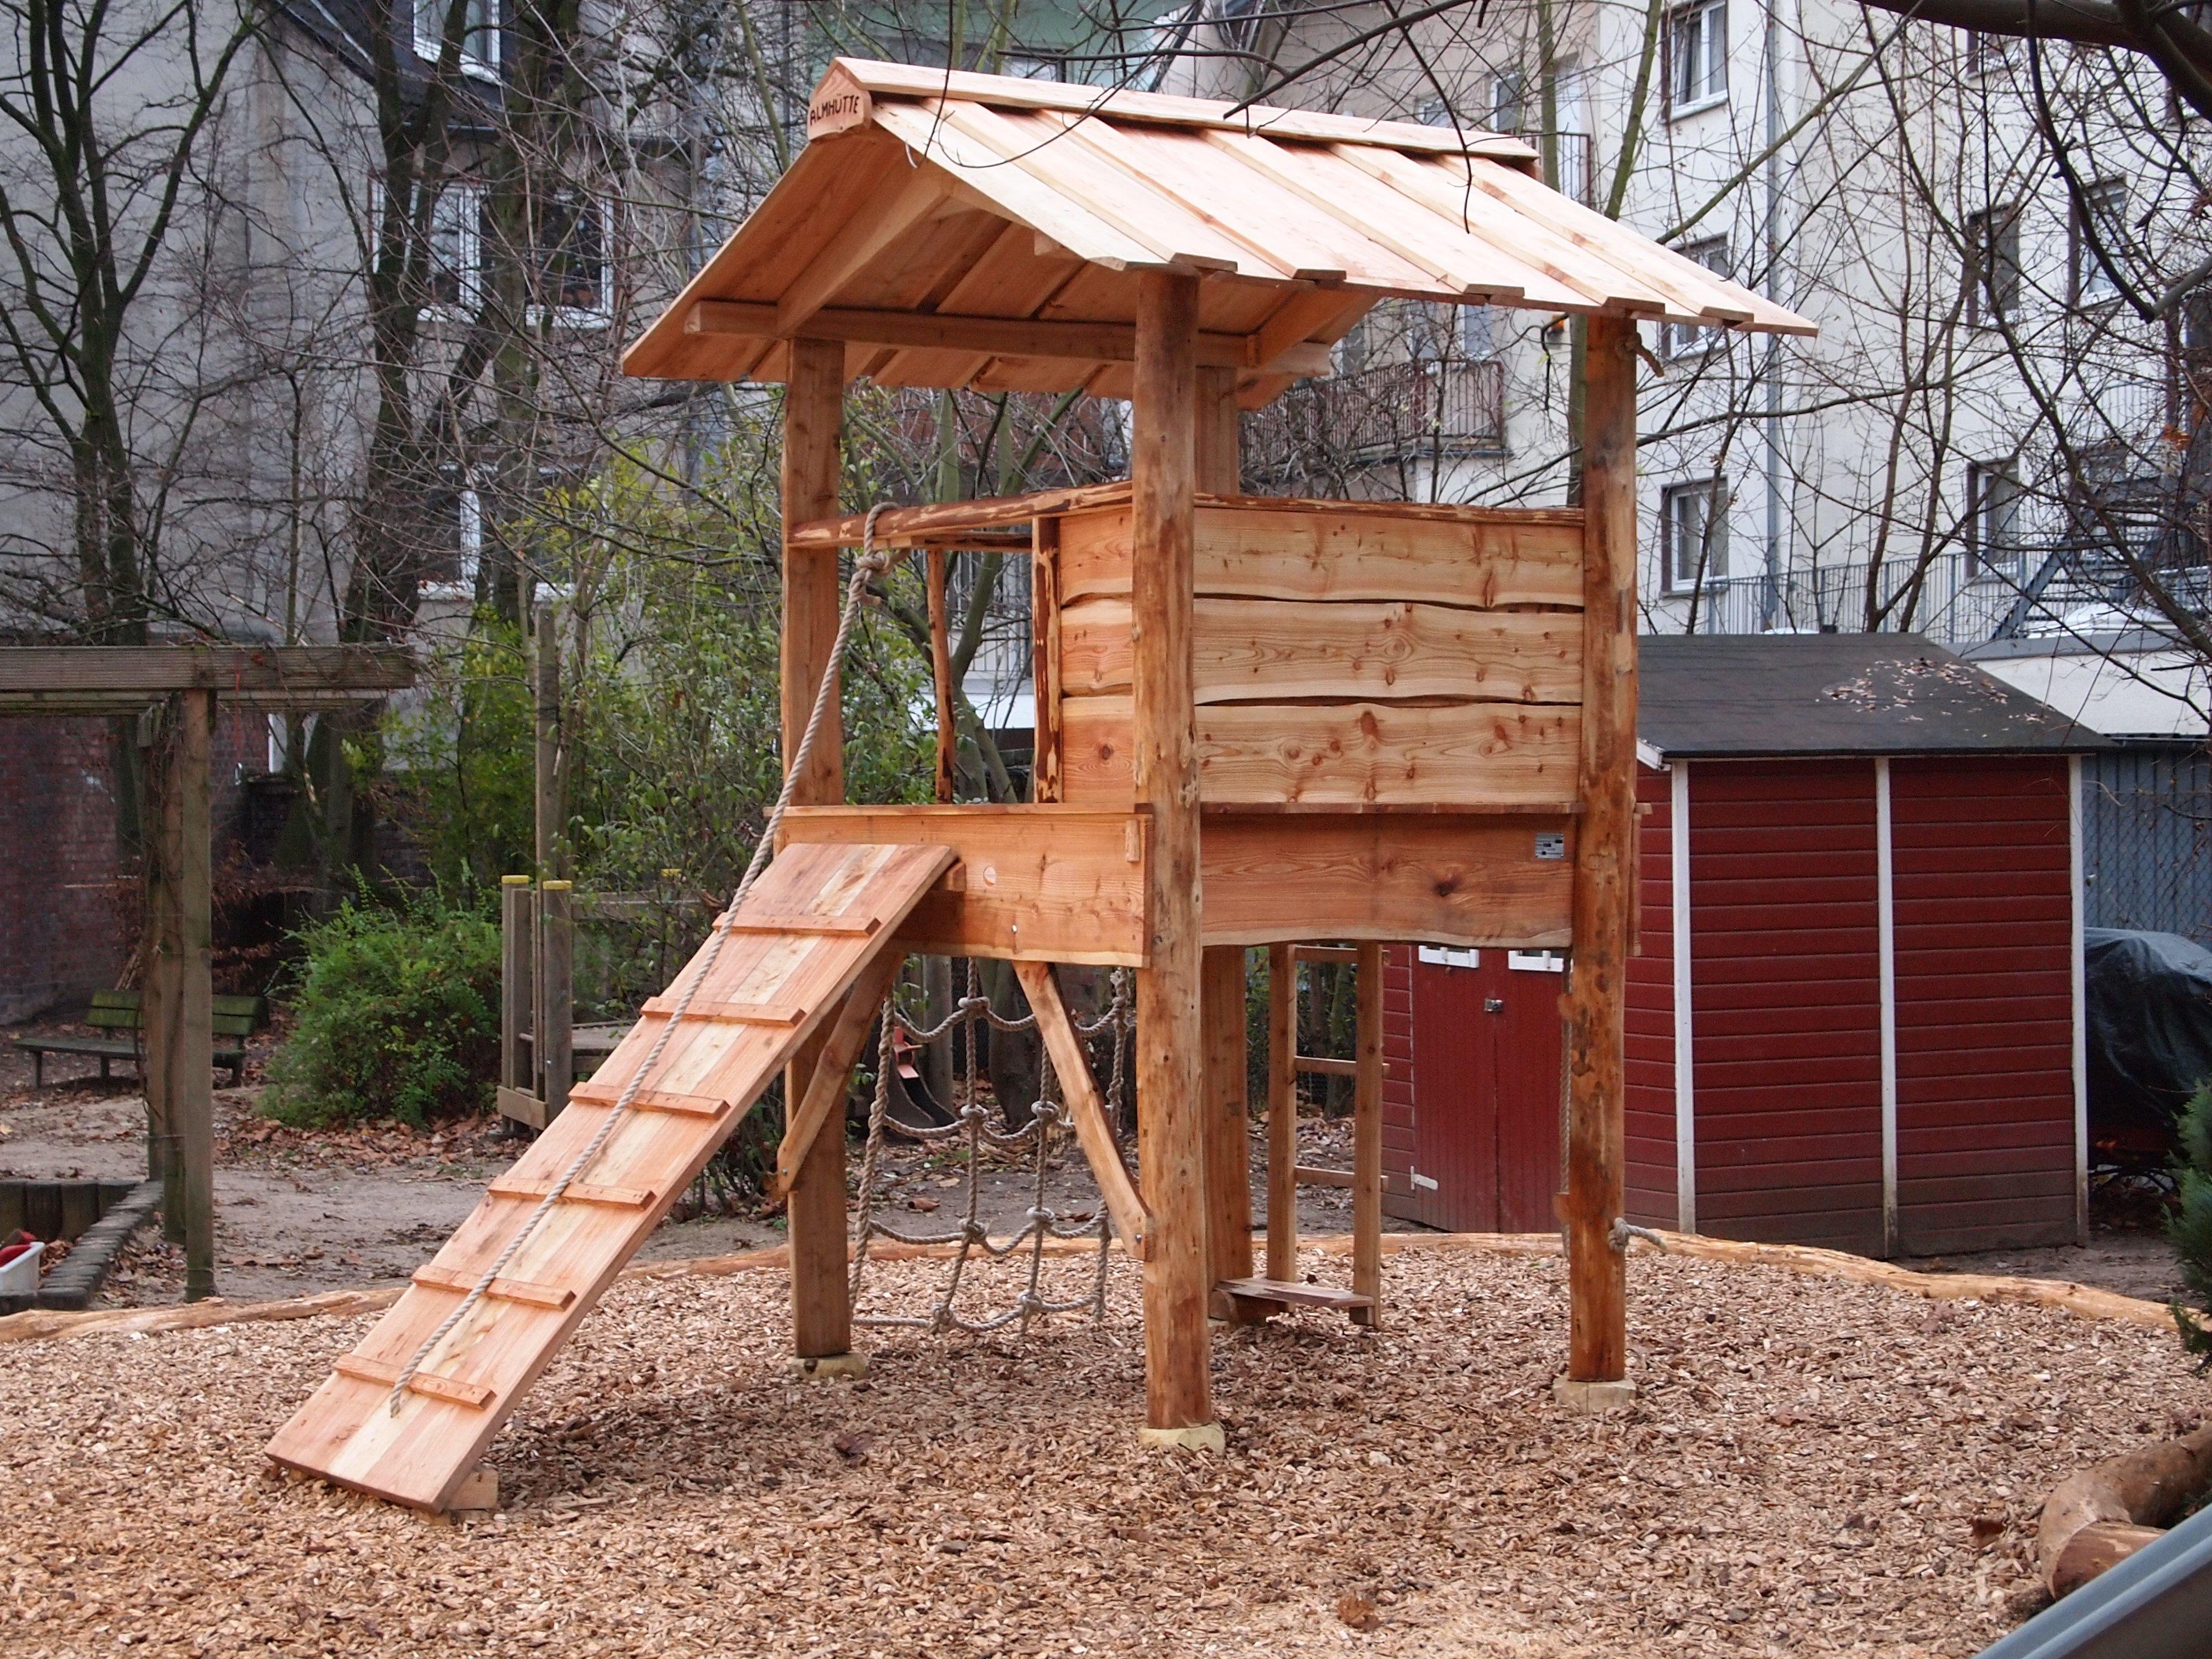 baumhaus f r kinder playhouse pinterest baumhaus f r kinder baumhaus und f r kinder. Black Bedroom Furniture Sets. Home Design Ideas